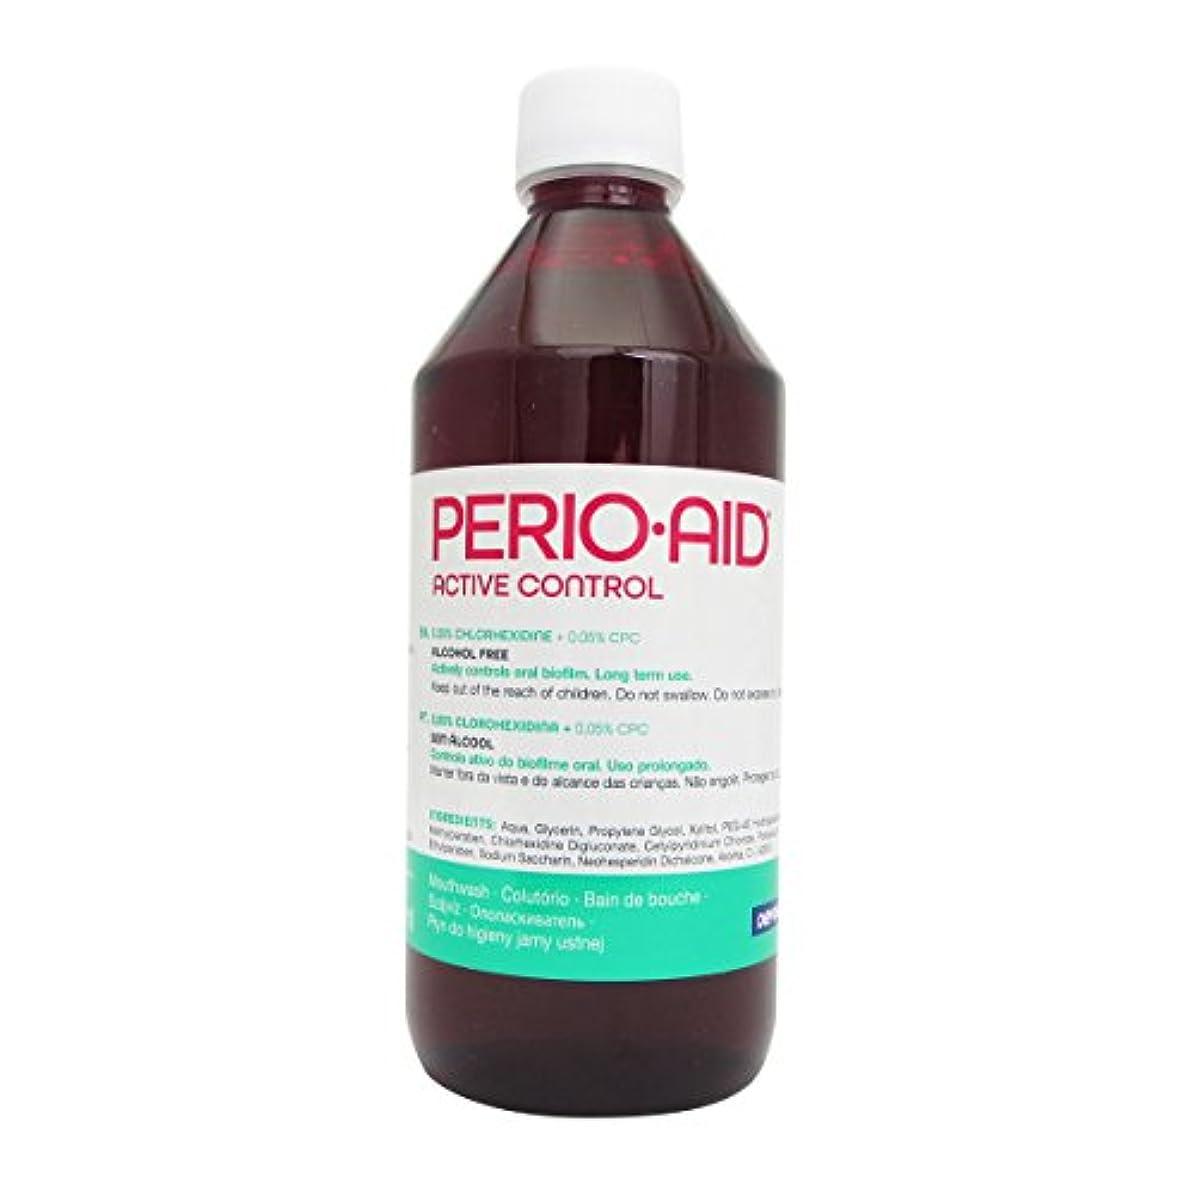 学部賞賛電報Perio-aid Maintenance Mouthwash 500ml [並行輸入品]